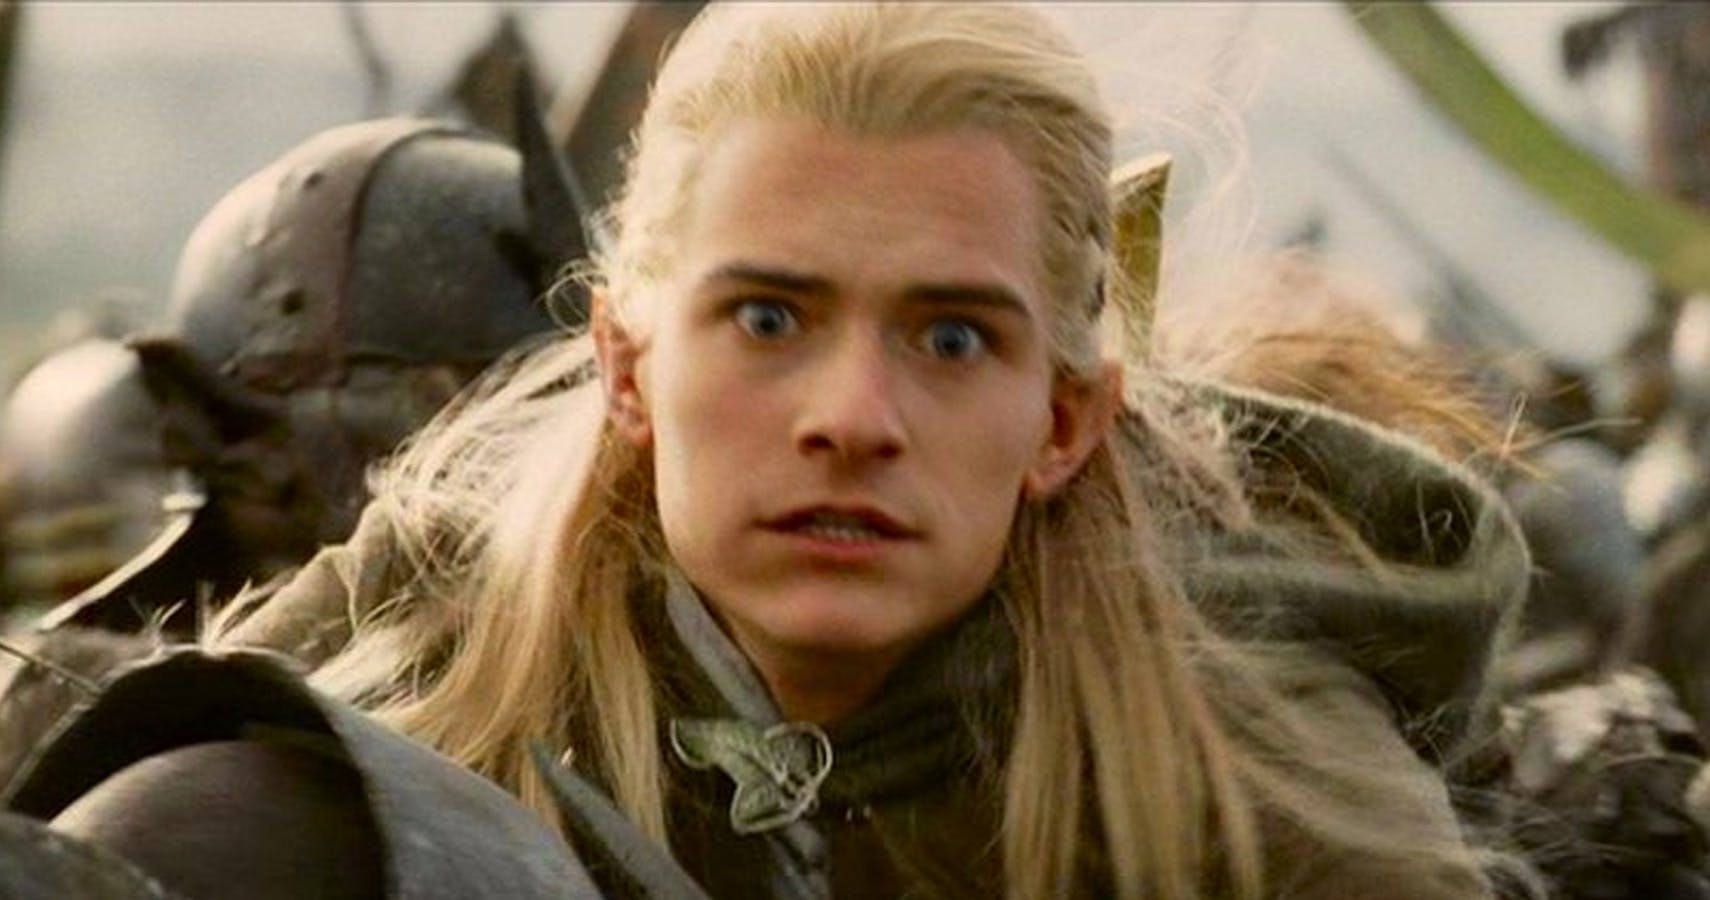 That awkward moment when everyone at a super secret council assumes the elves still have Gollum